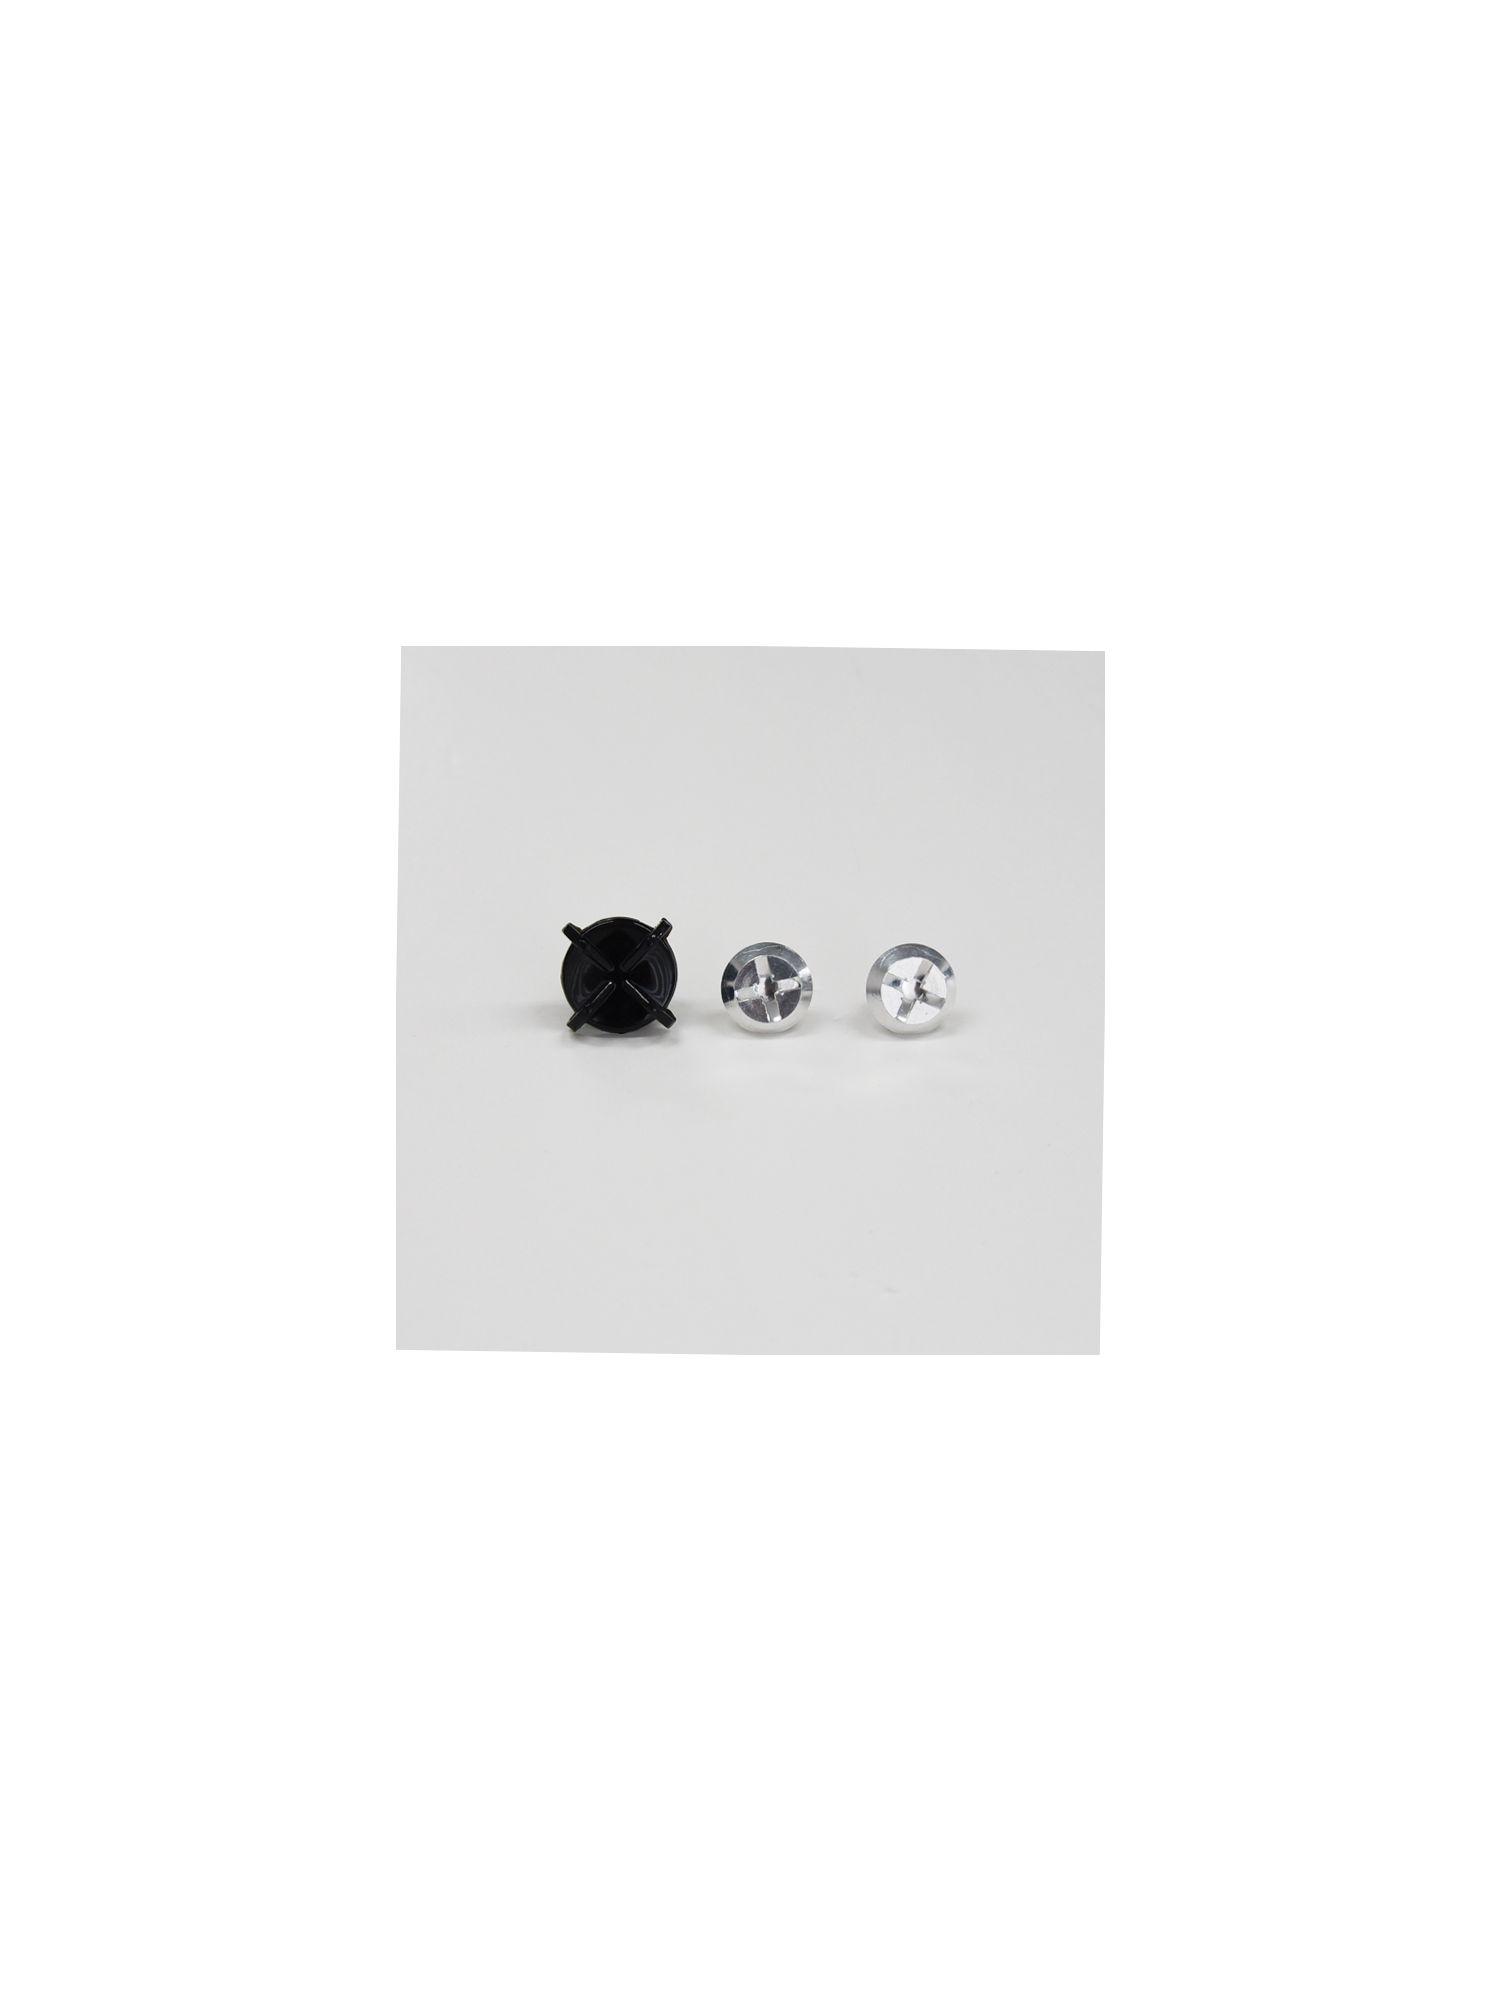 HJP606 | バイザースクリューセット:CL-XYⅡ